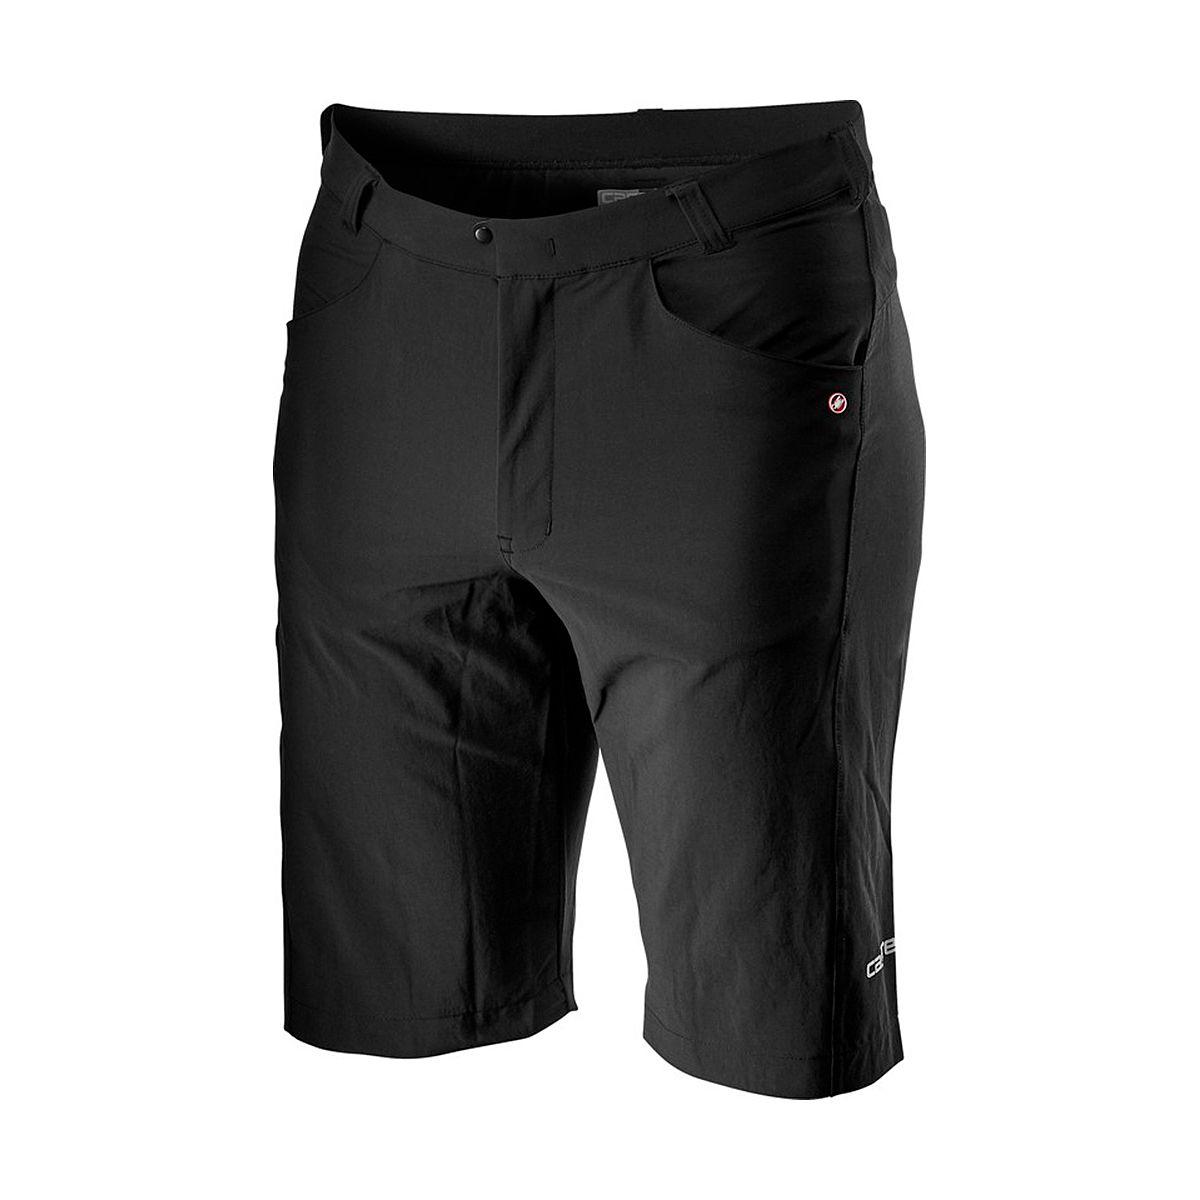 CASTELLI Pantaloncini Uomo Unlimited Baggy - Nero